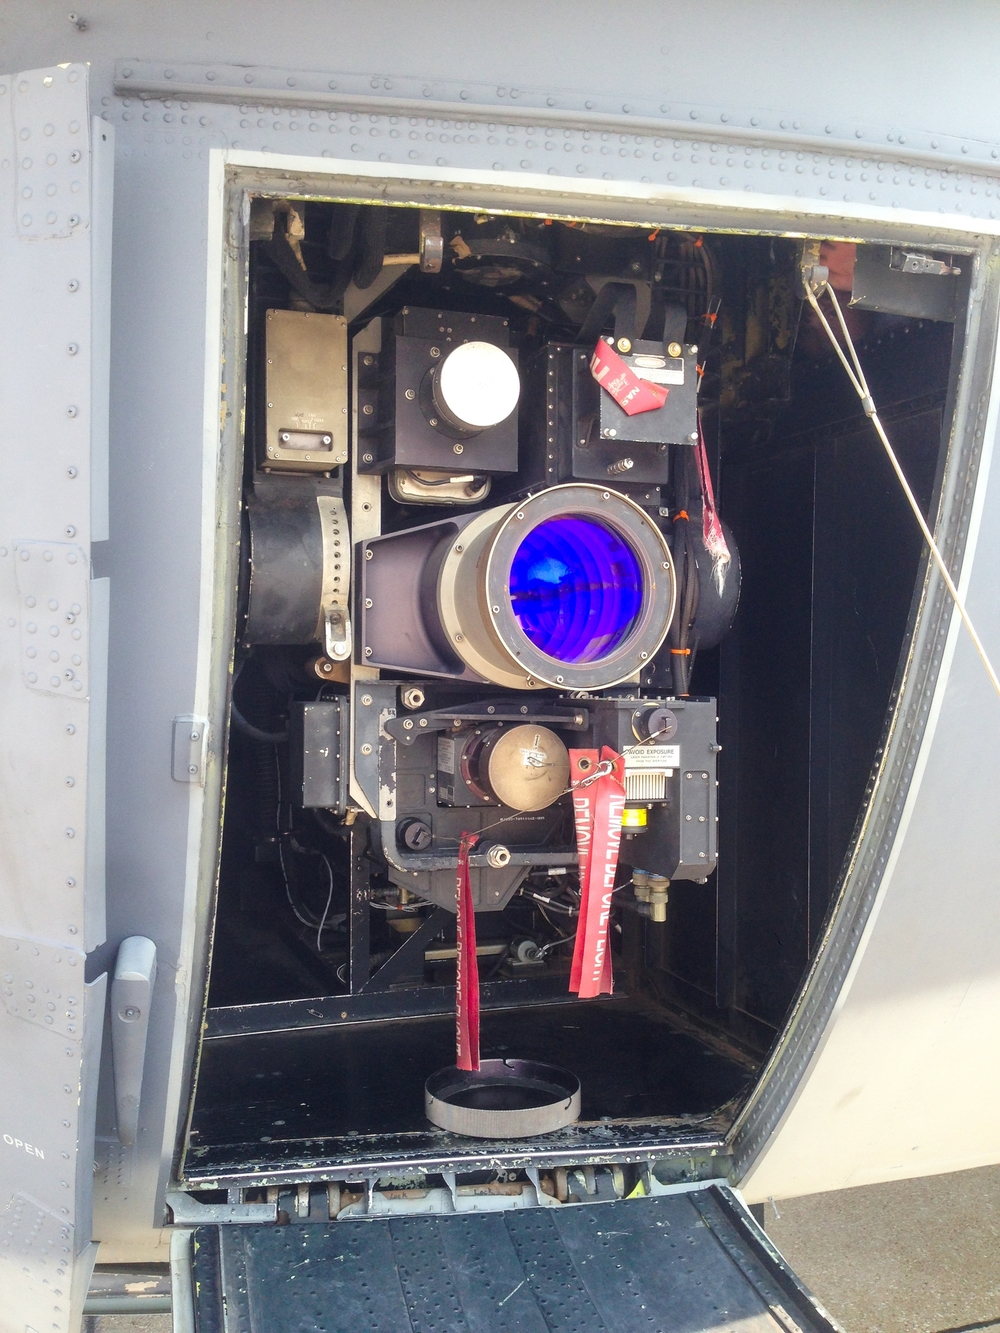 The AC-130's forward sensors